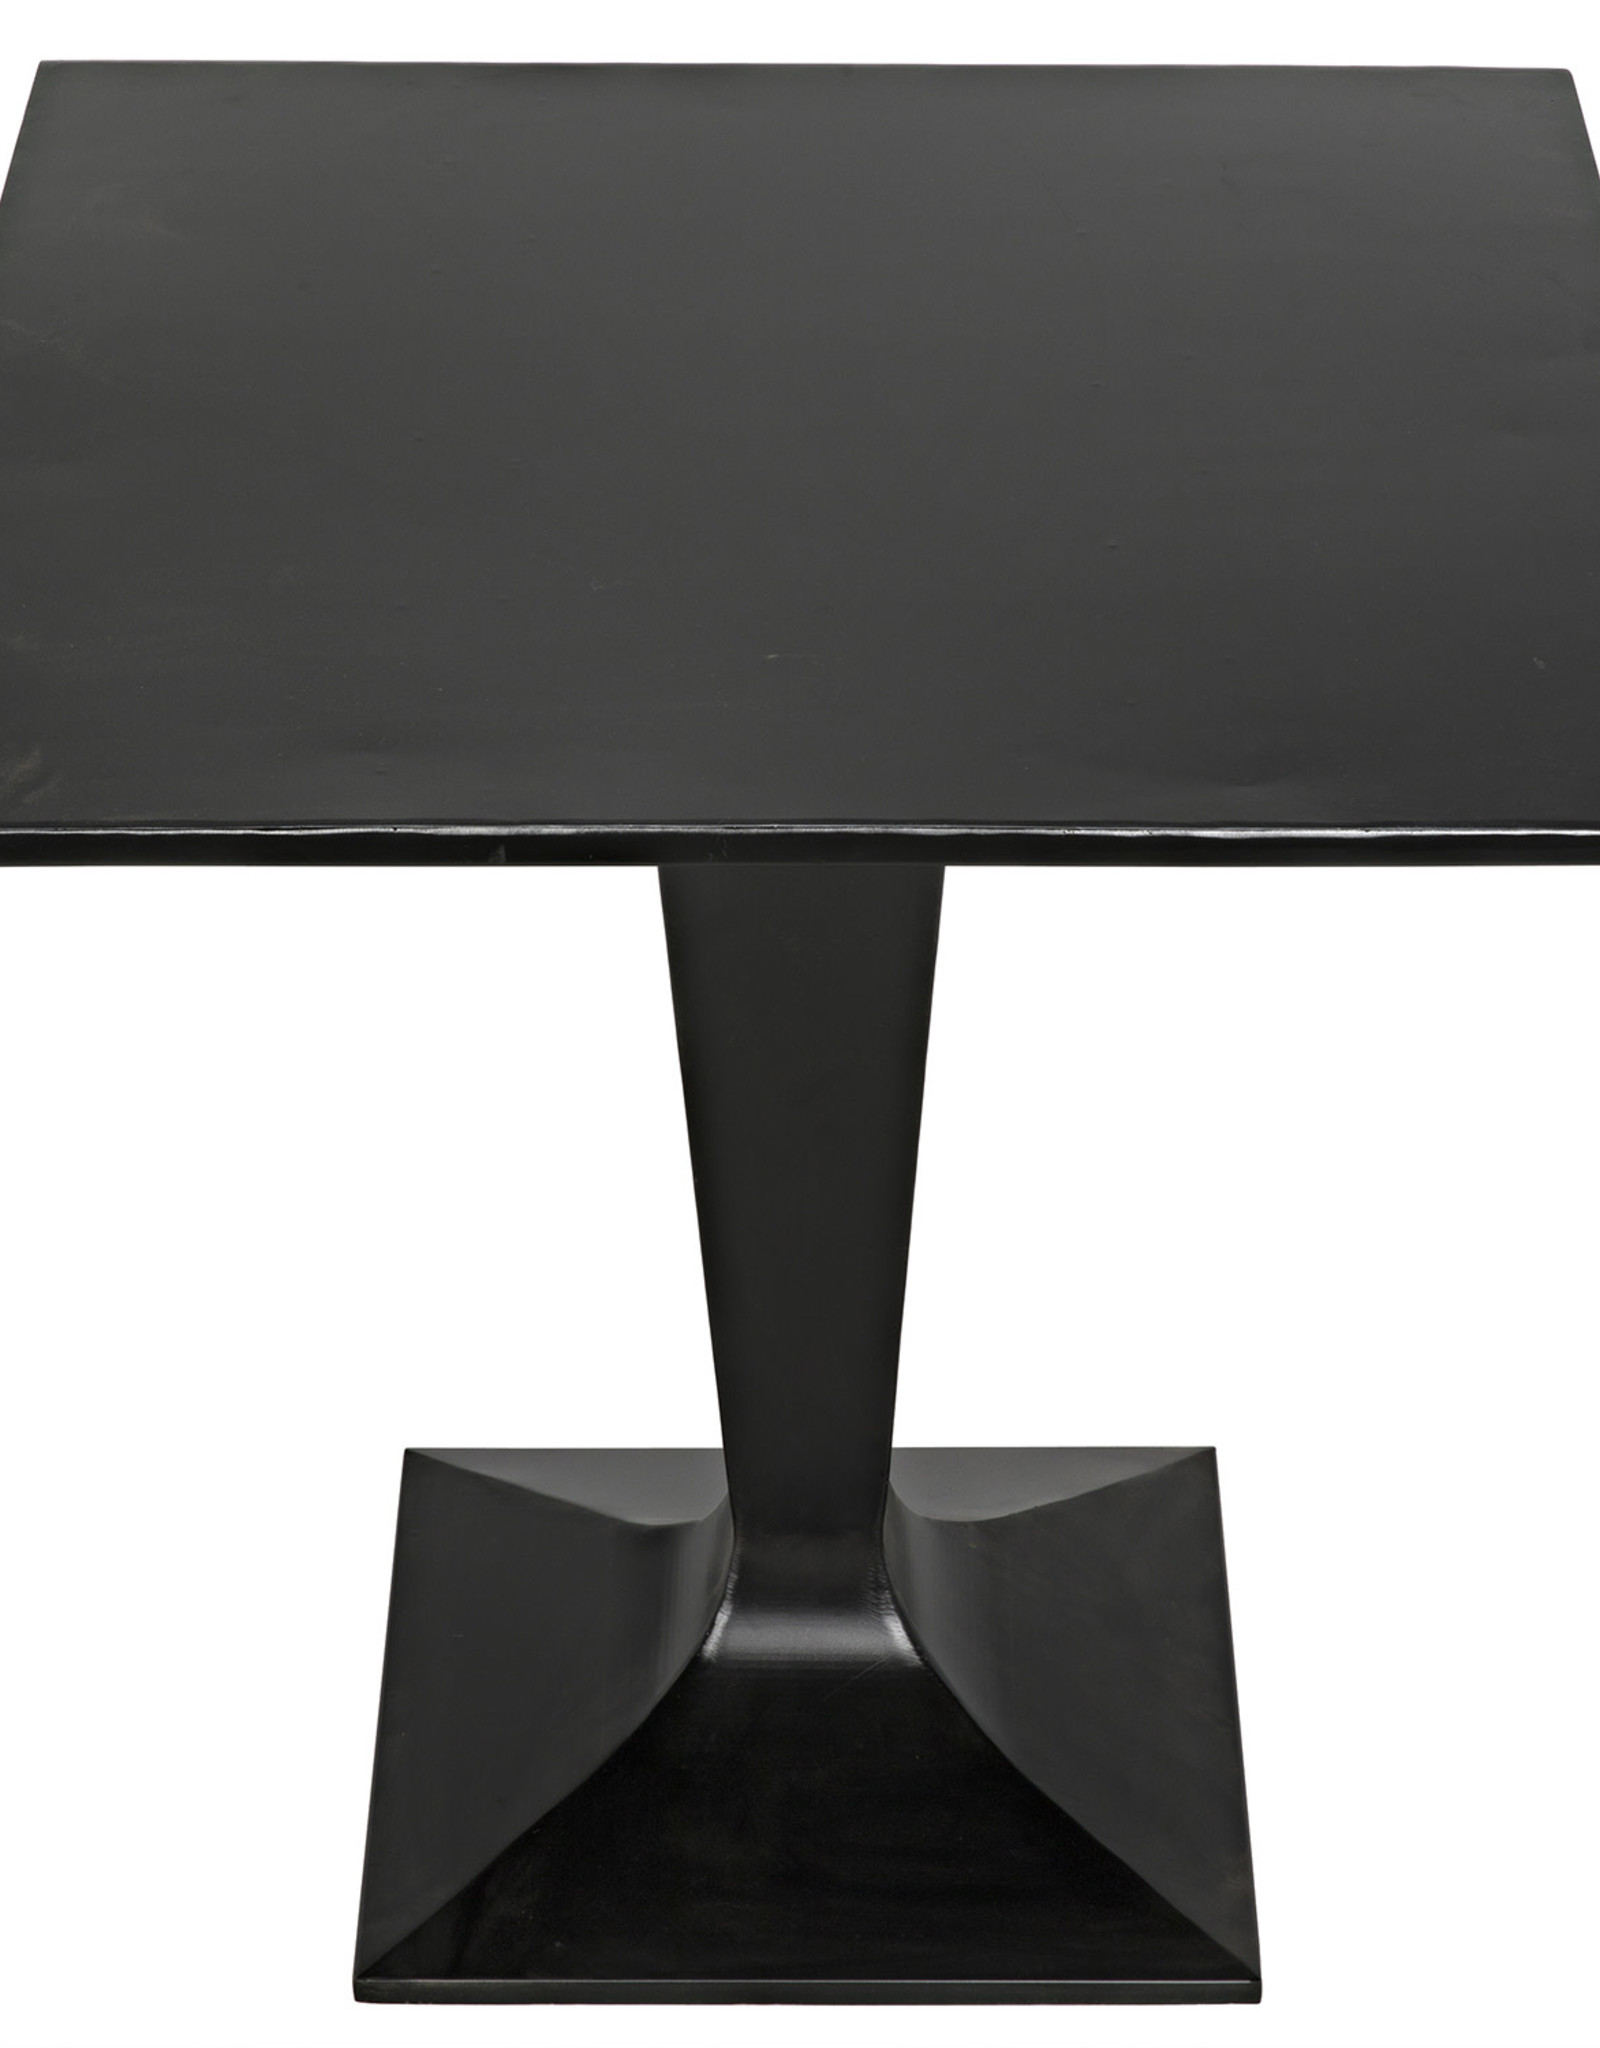 Website Noir Anoil Bistro Table